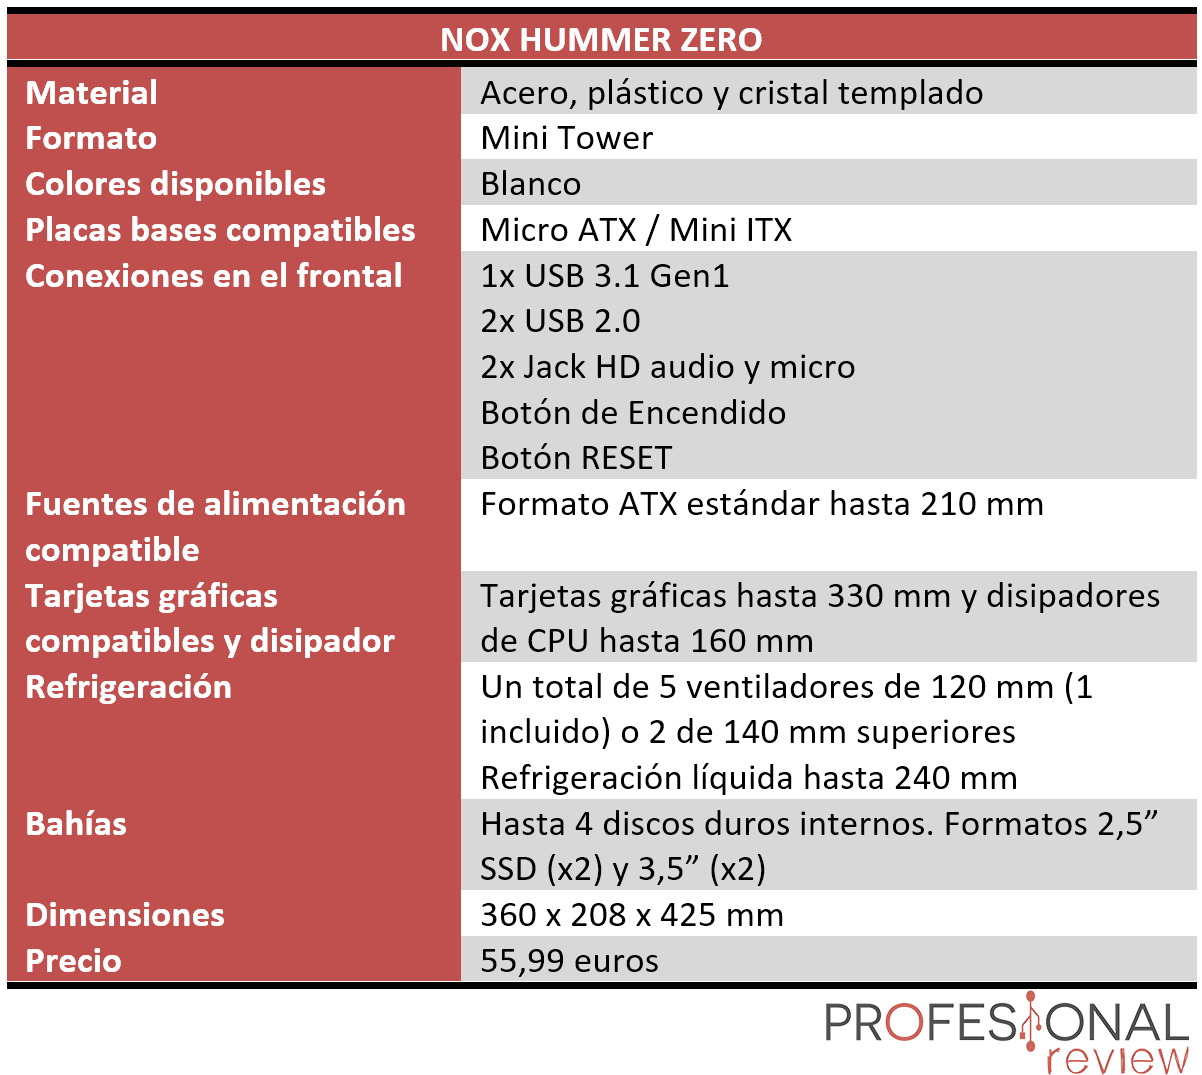 NOX HUMMER ZERO características